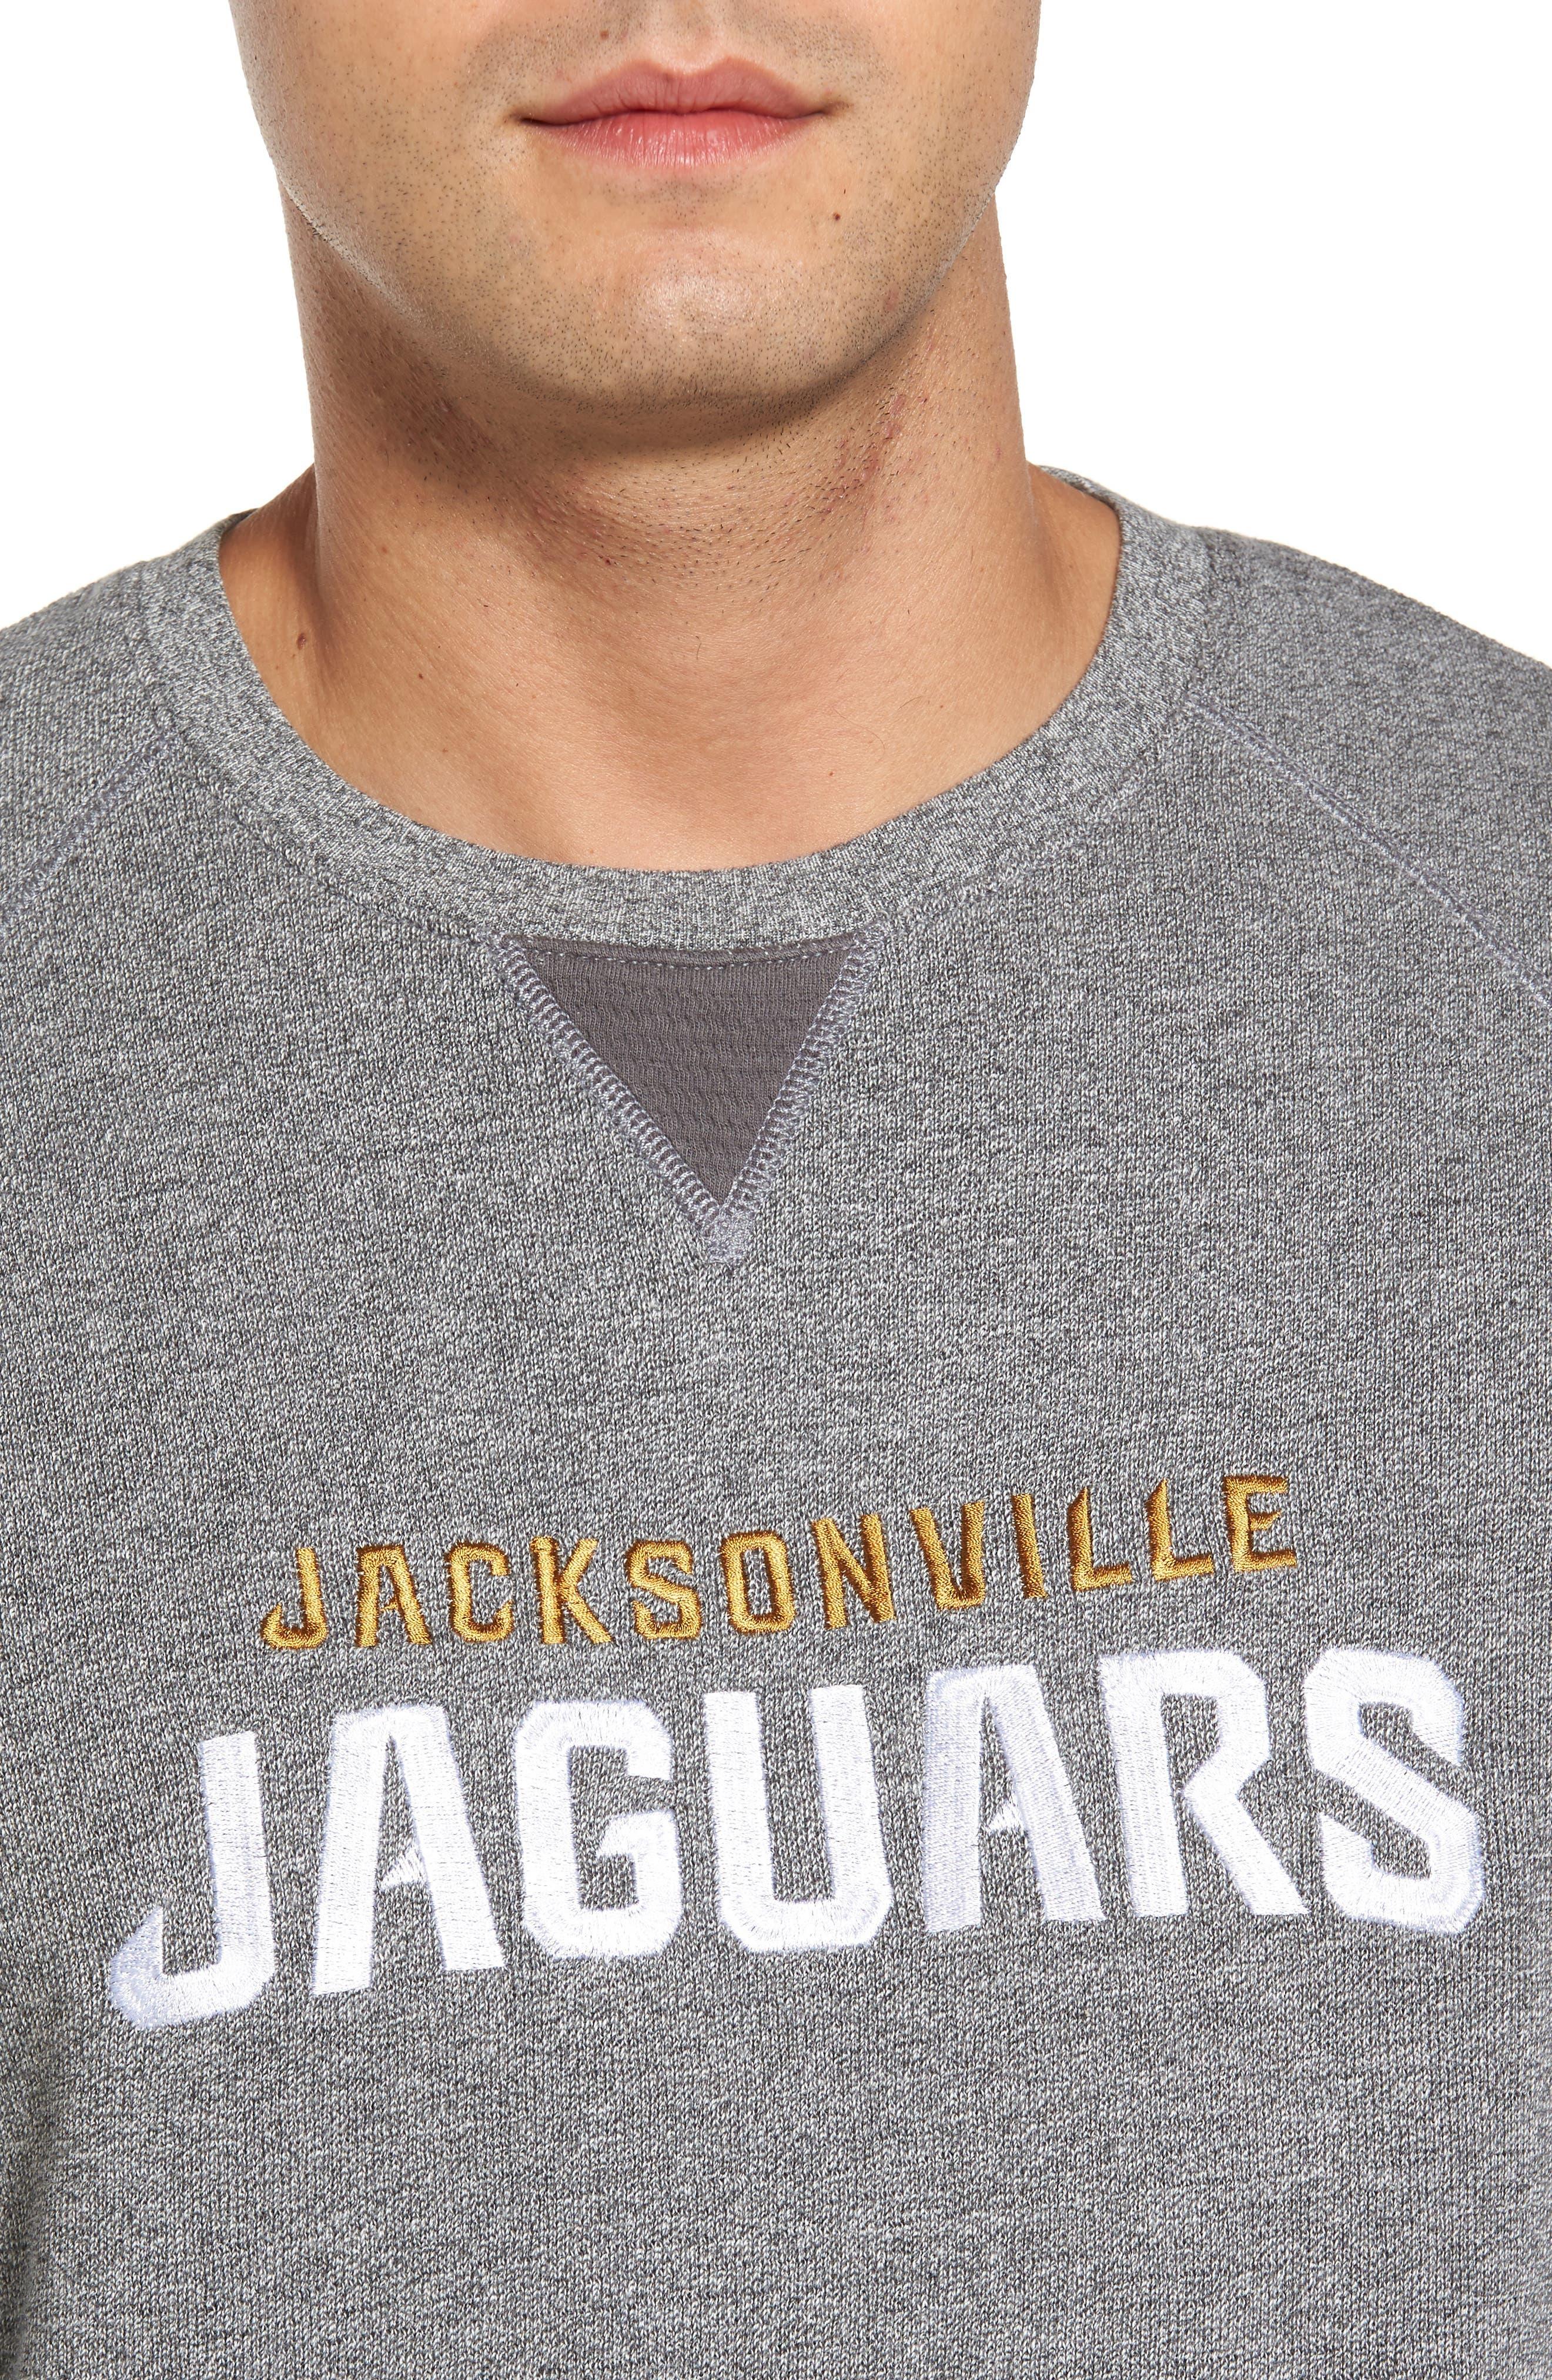 NFL Stitch of Liberty Embroidered Crewneck Sweatshirt,                             Alternate thumbnail 108, color,